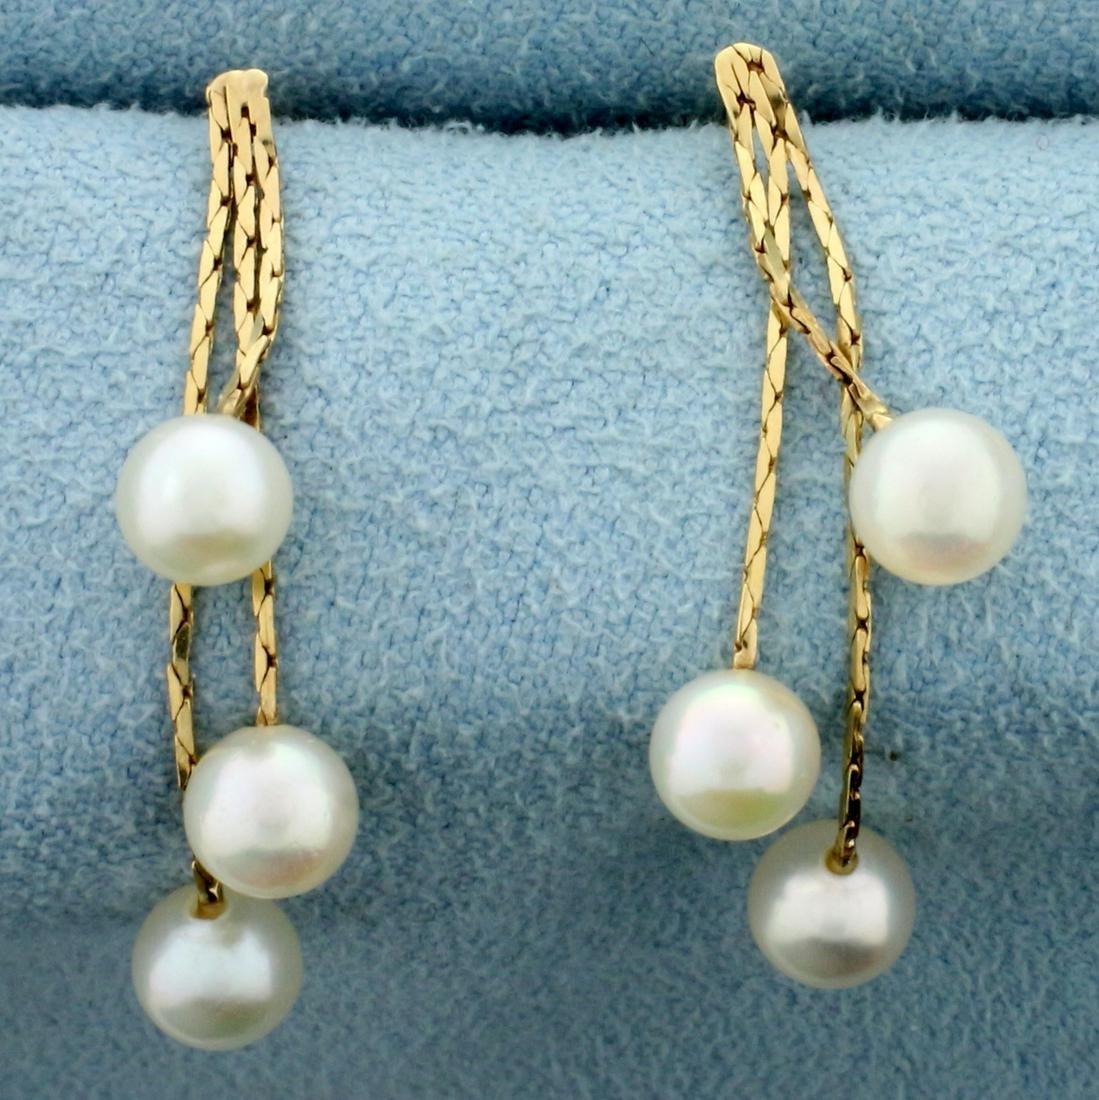 Cultured Pearl Dangle Earrings in 14K Yellow Gold